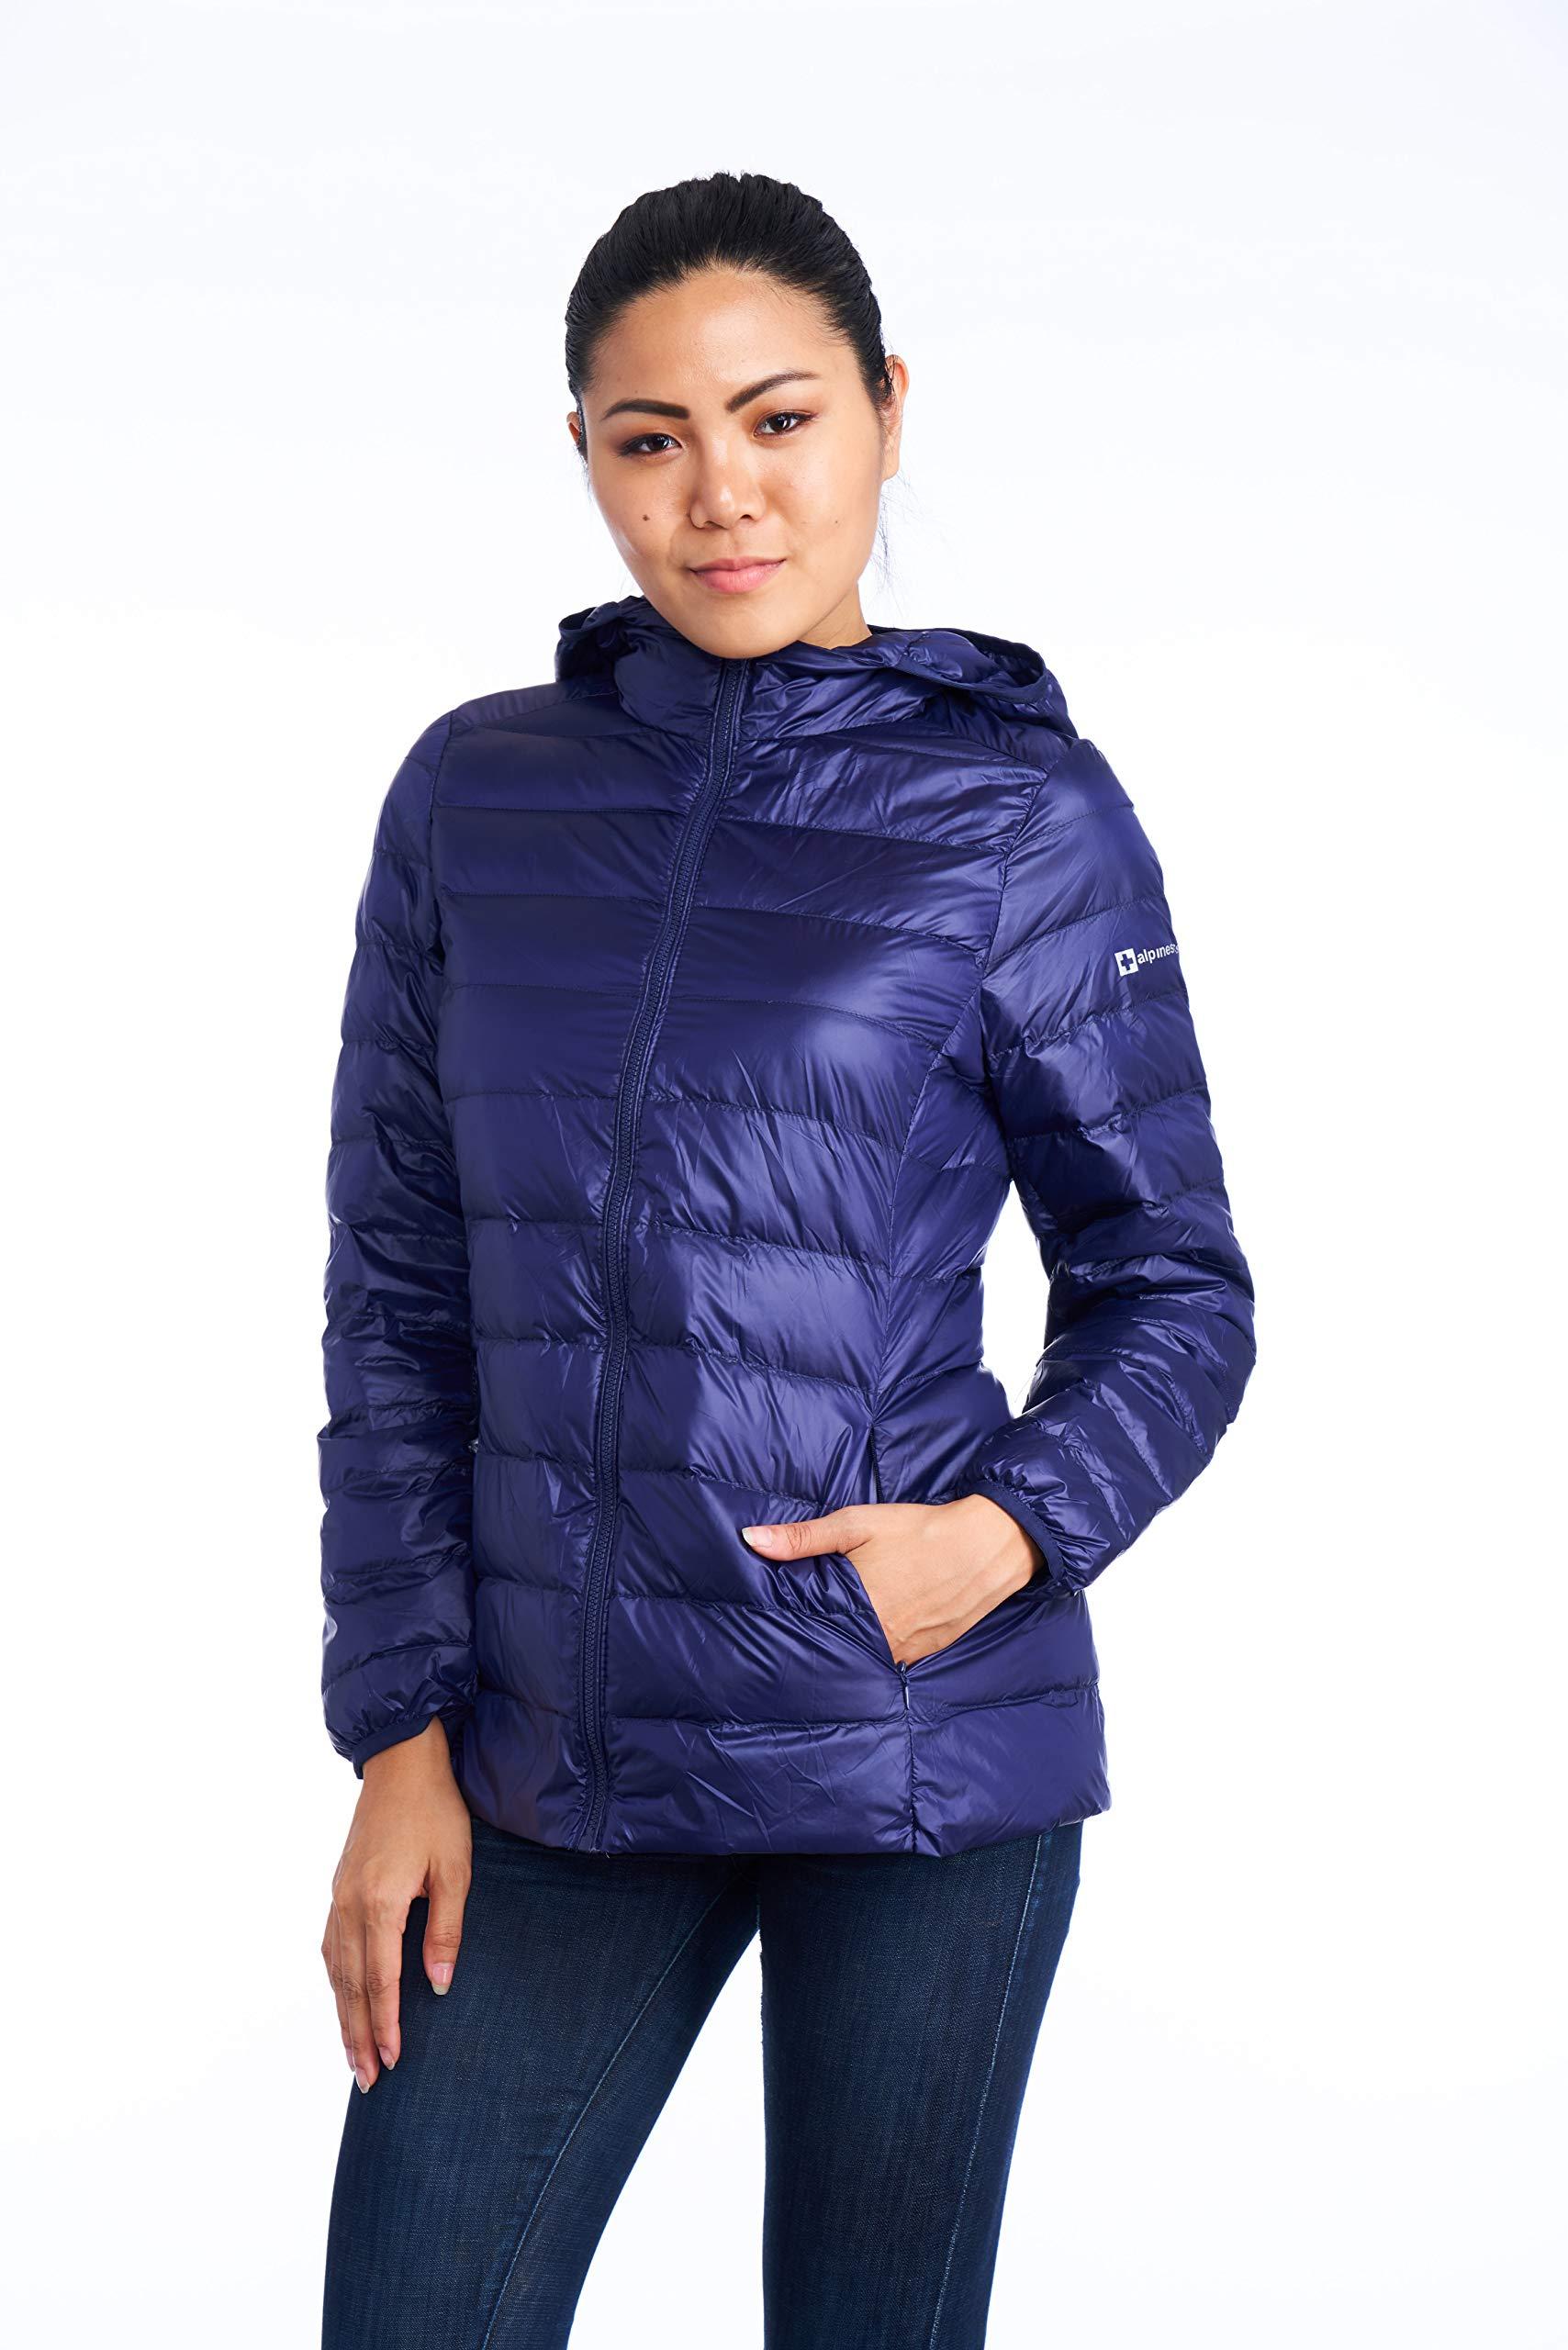 alpine swiss Eva Womens Down Jacket Hooded Puffer Coat Packable Insulation & Light NVY SML